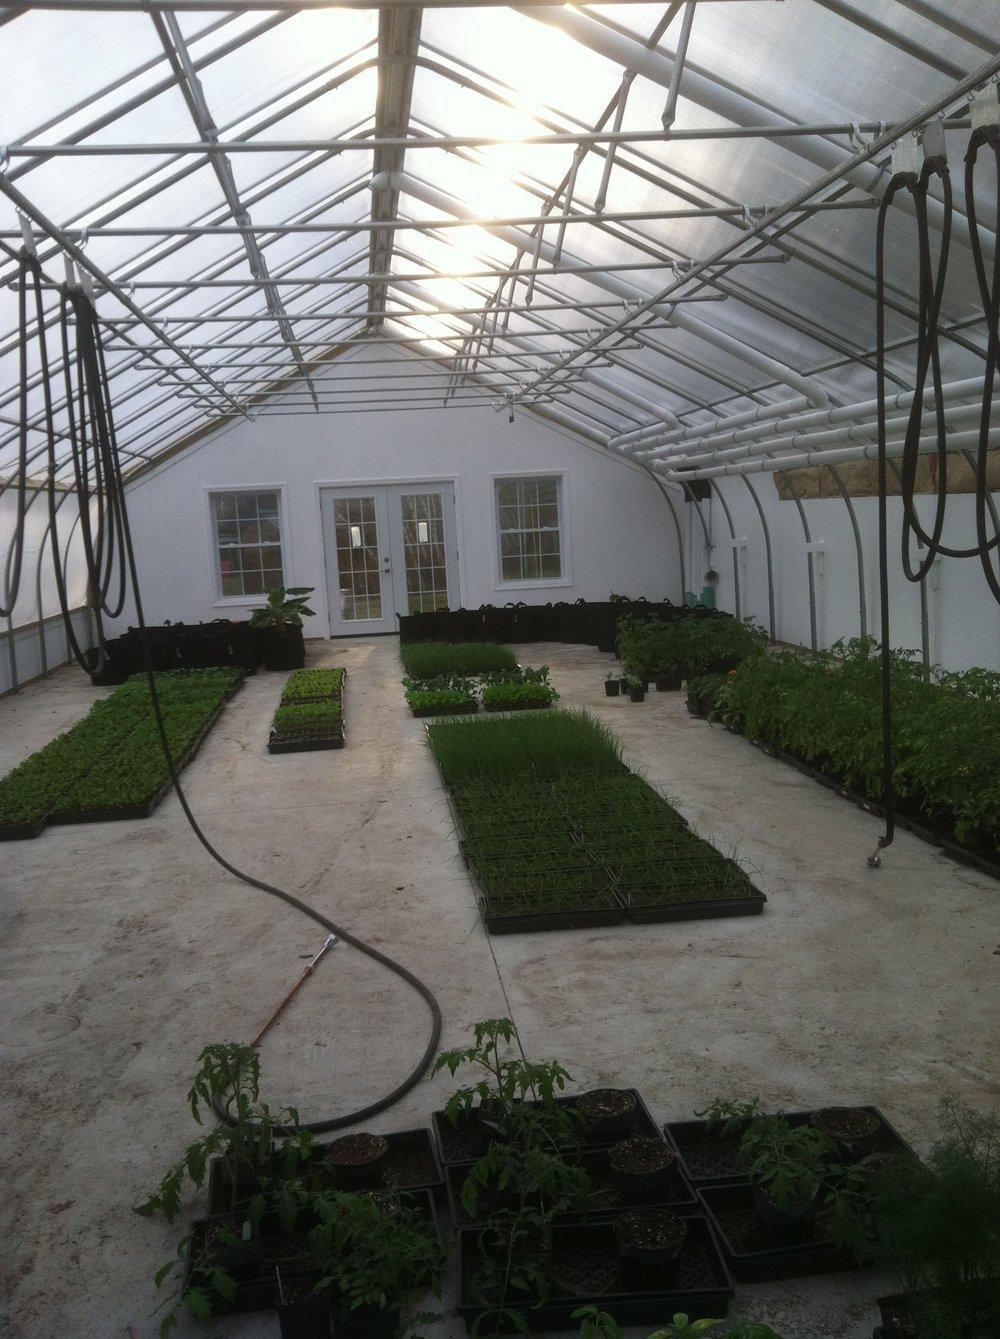 Seedlings in new greenhouse.